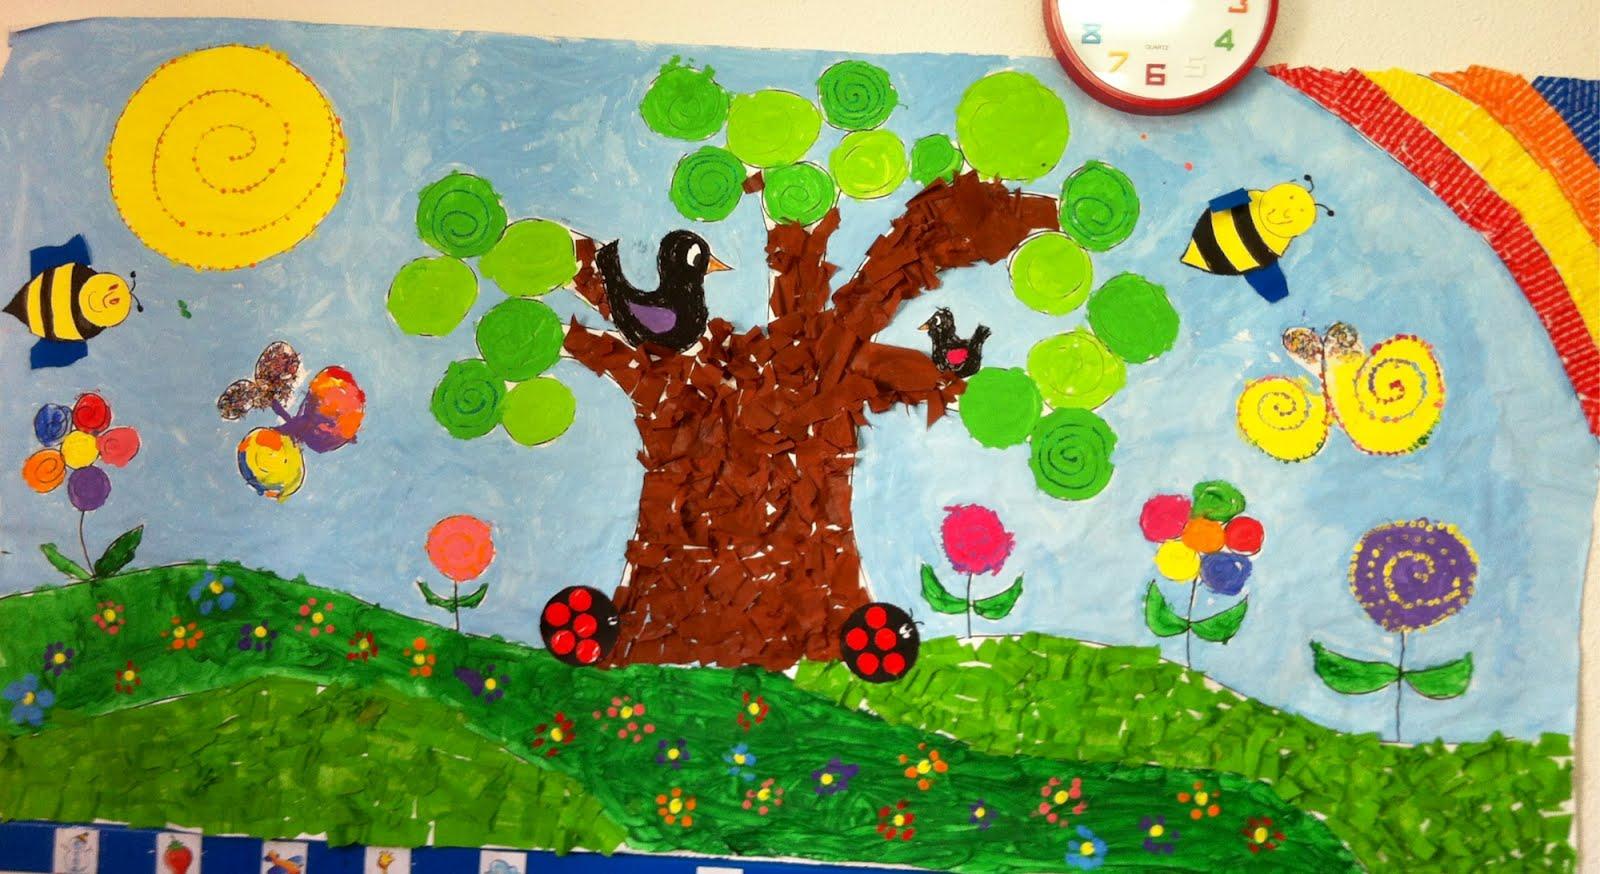 Murales primavera 4 imagenes educativas for Ahuyentar abejas jardin